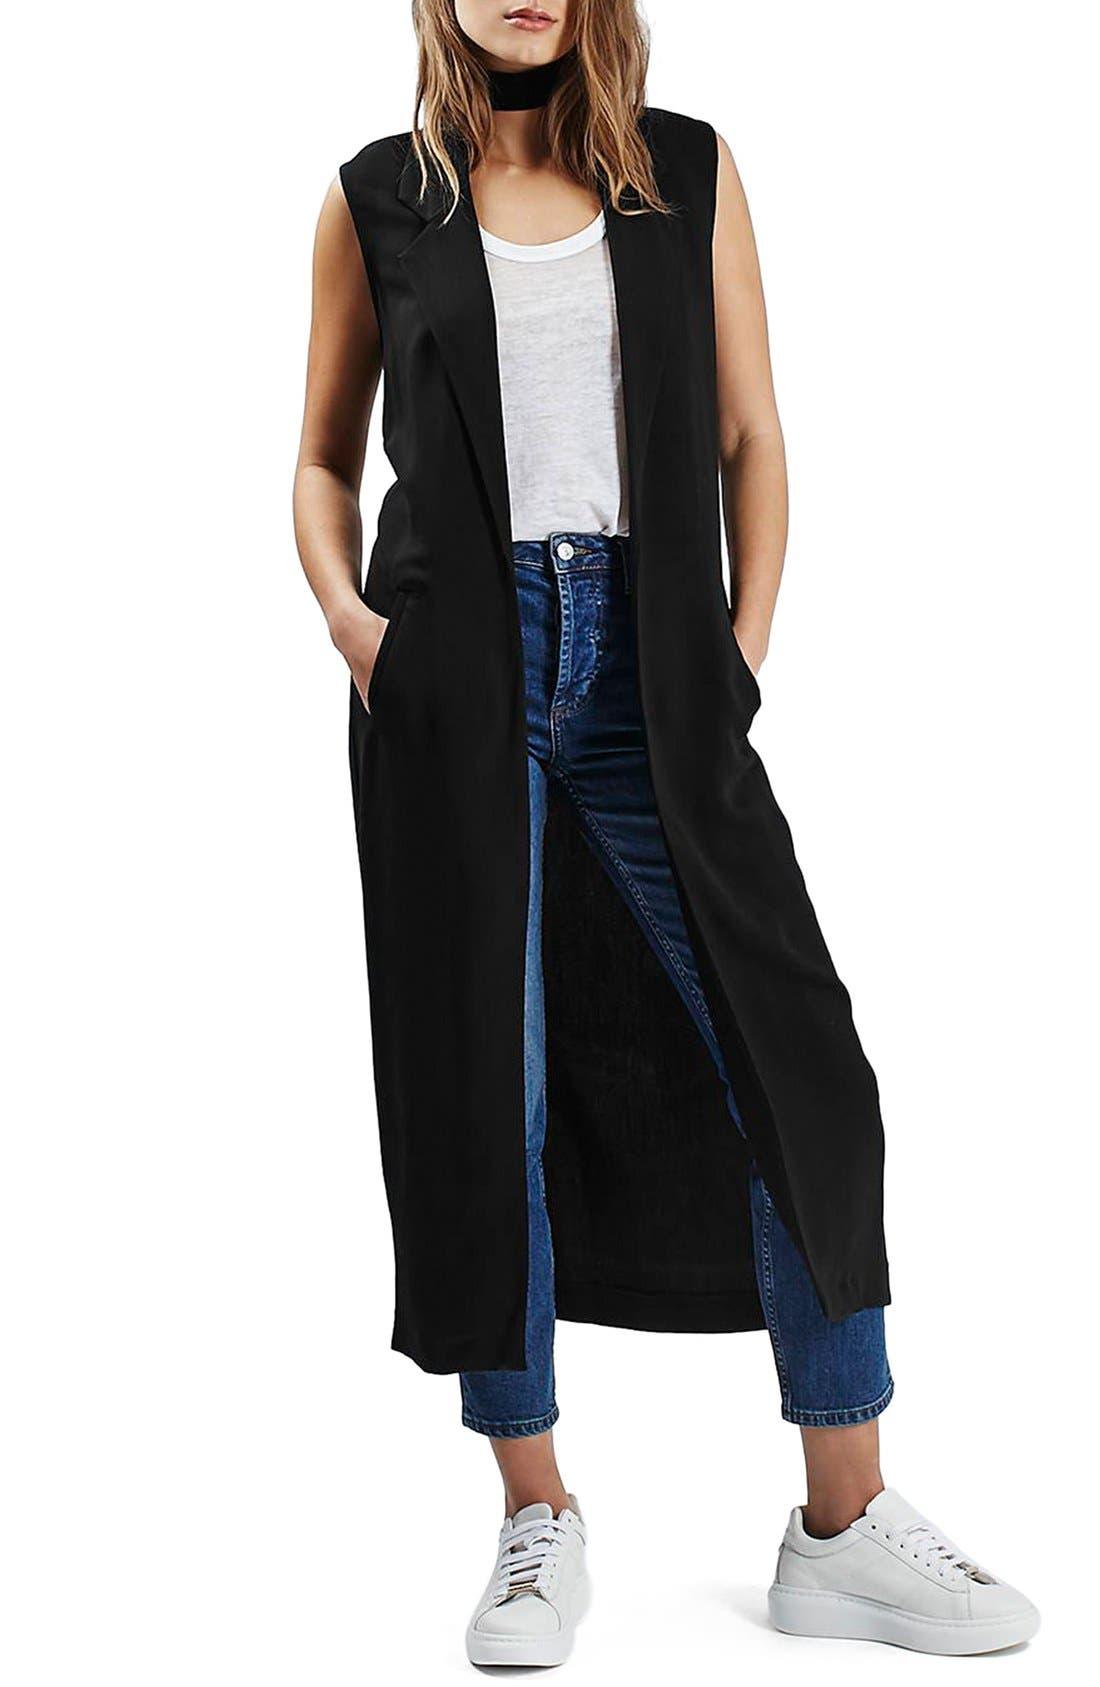 Alternate Image 1 Selected - Topshop Sleeveless Duster Coat